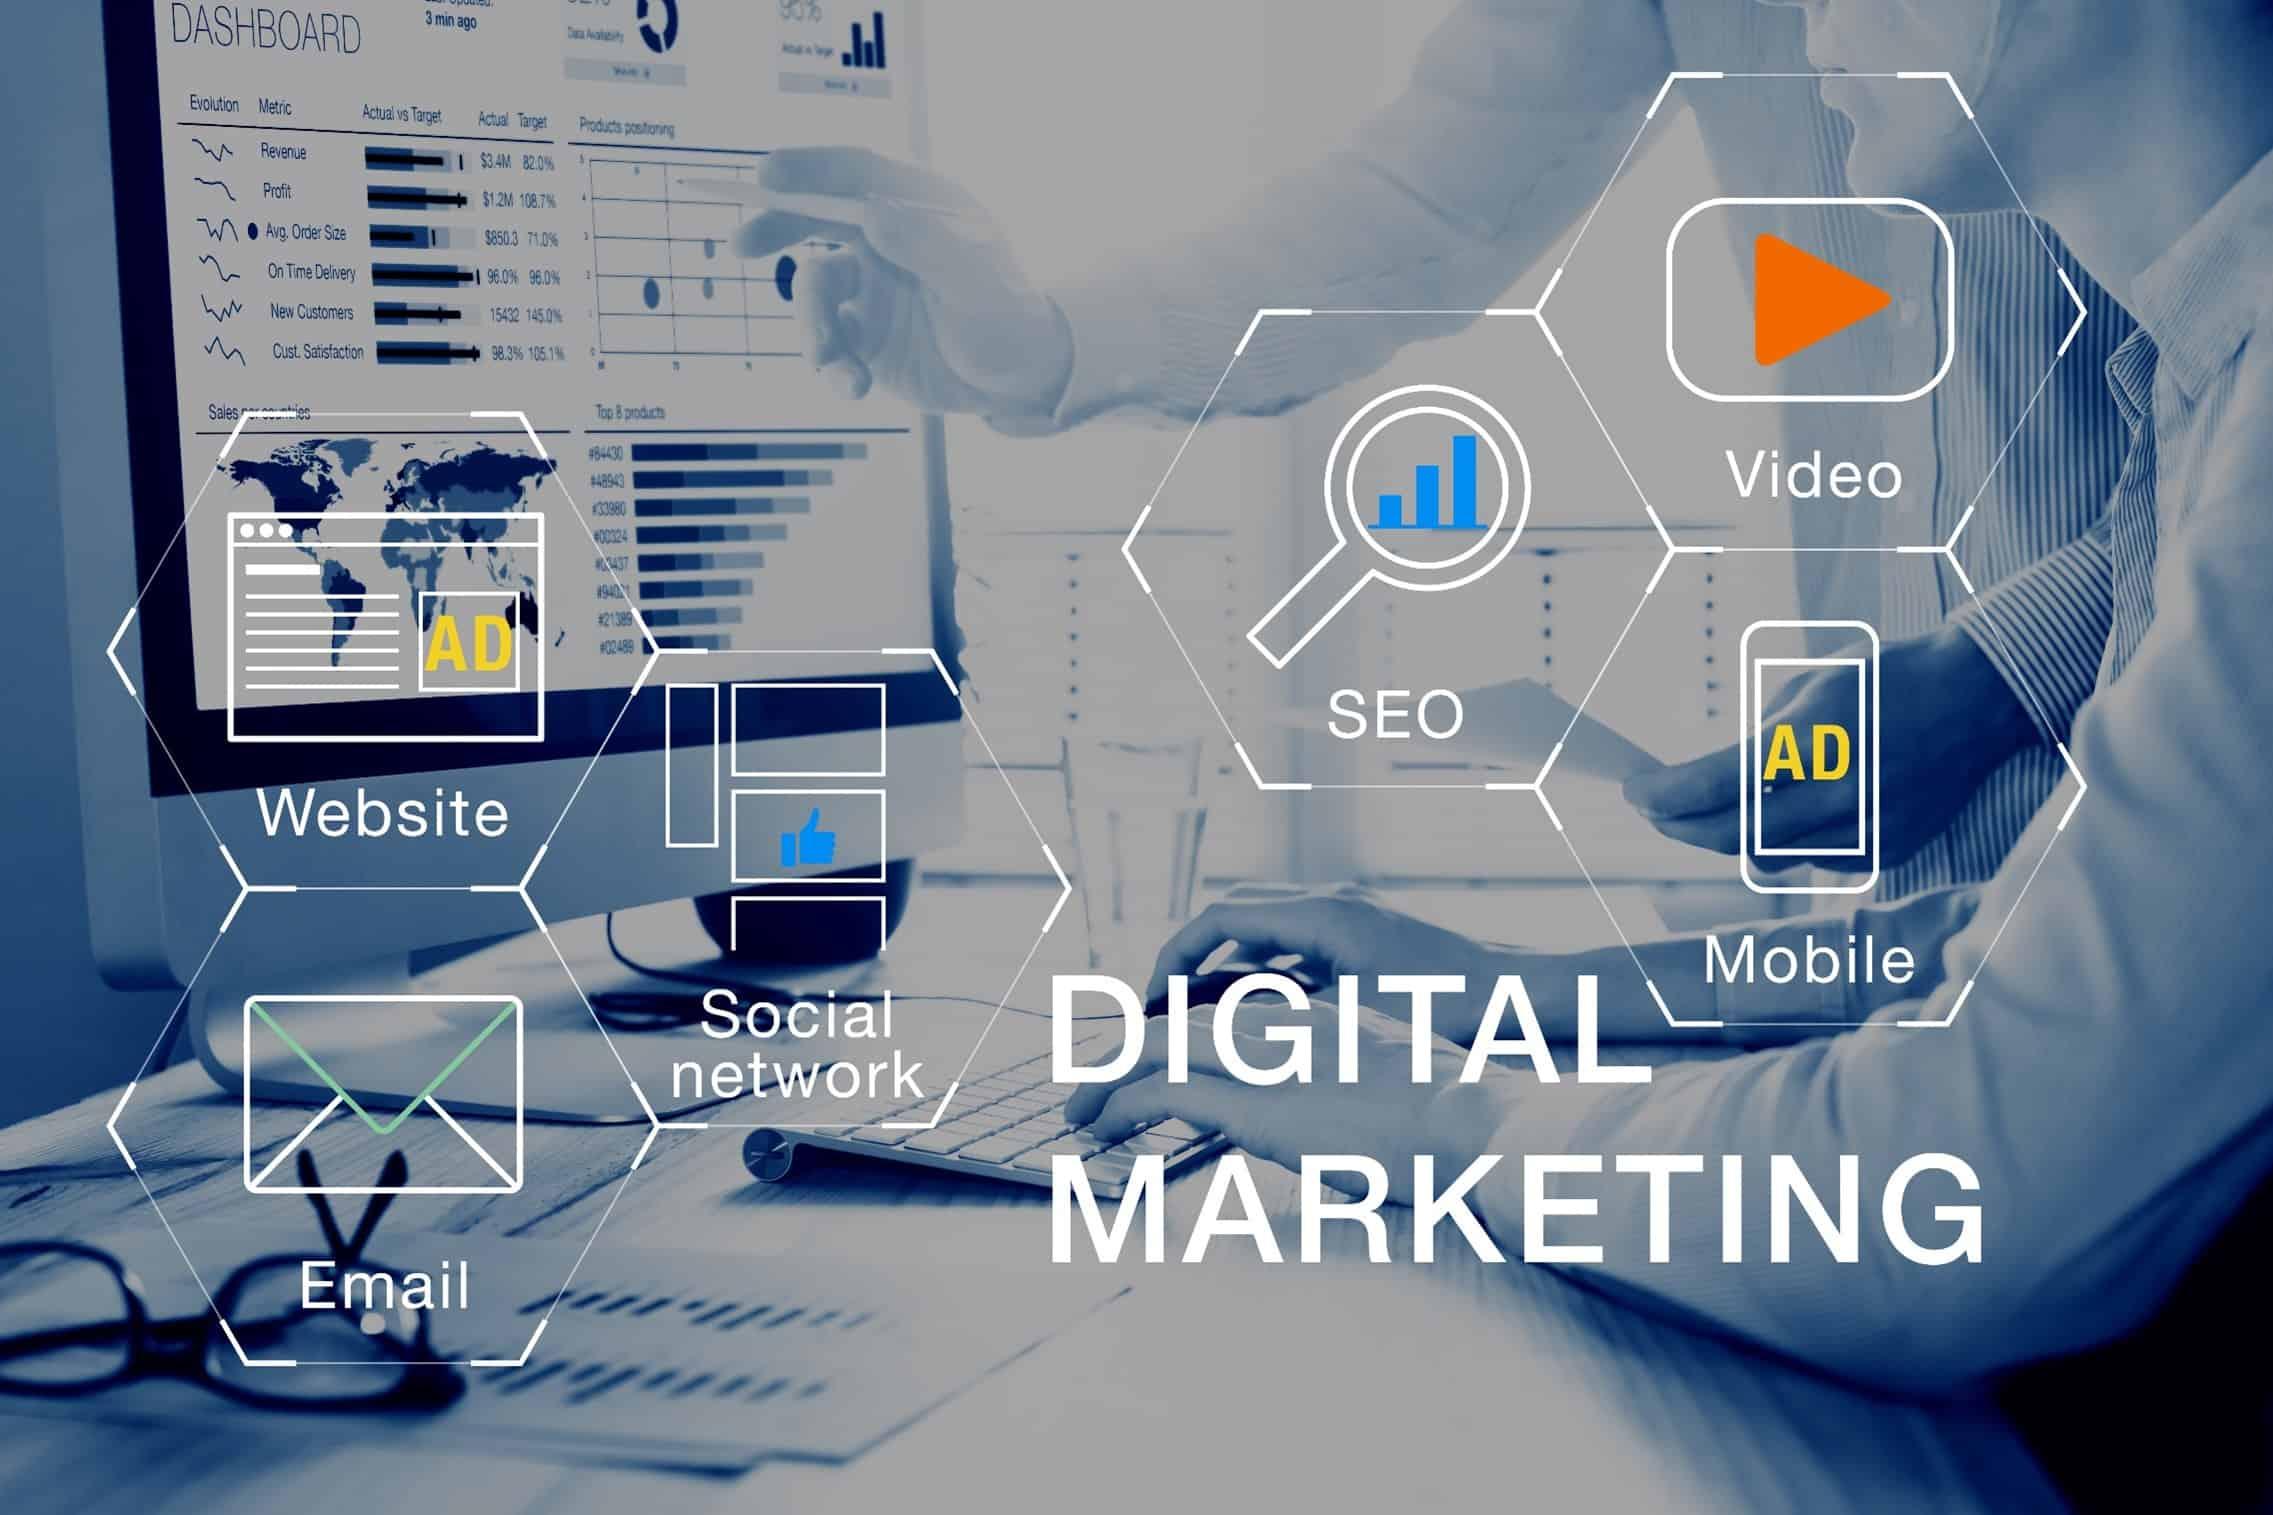 Digital Marketing Skills Needed Today Graphic